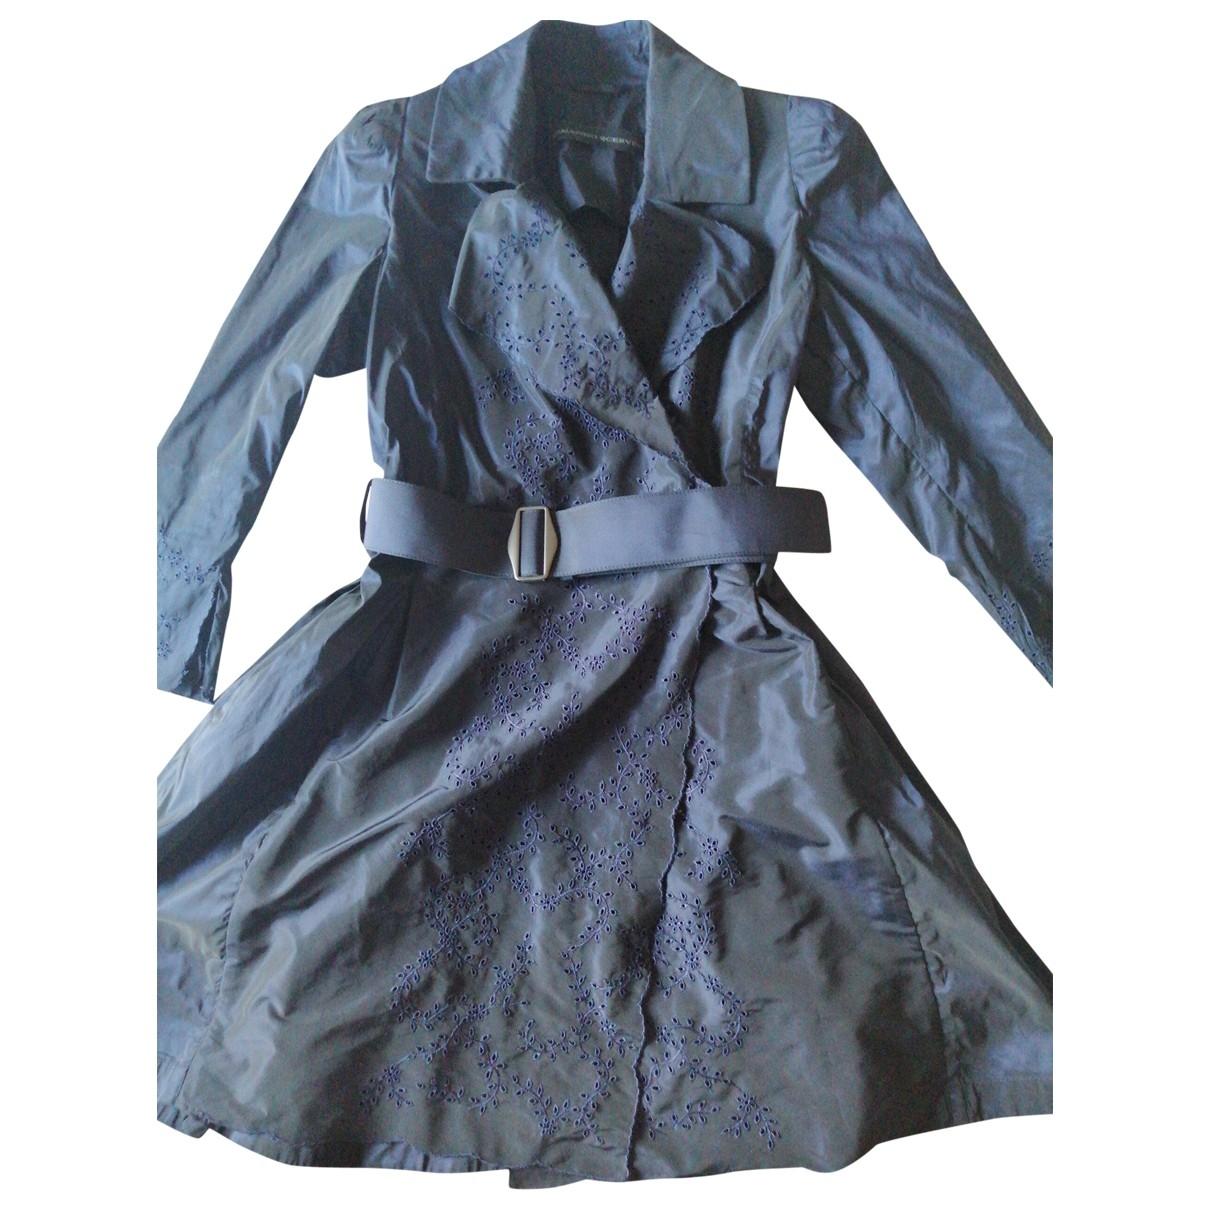 Ermanno Scervino \N Blue dress for Women 44 IT